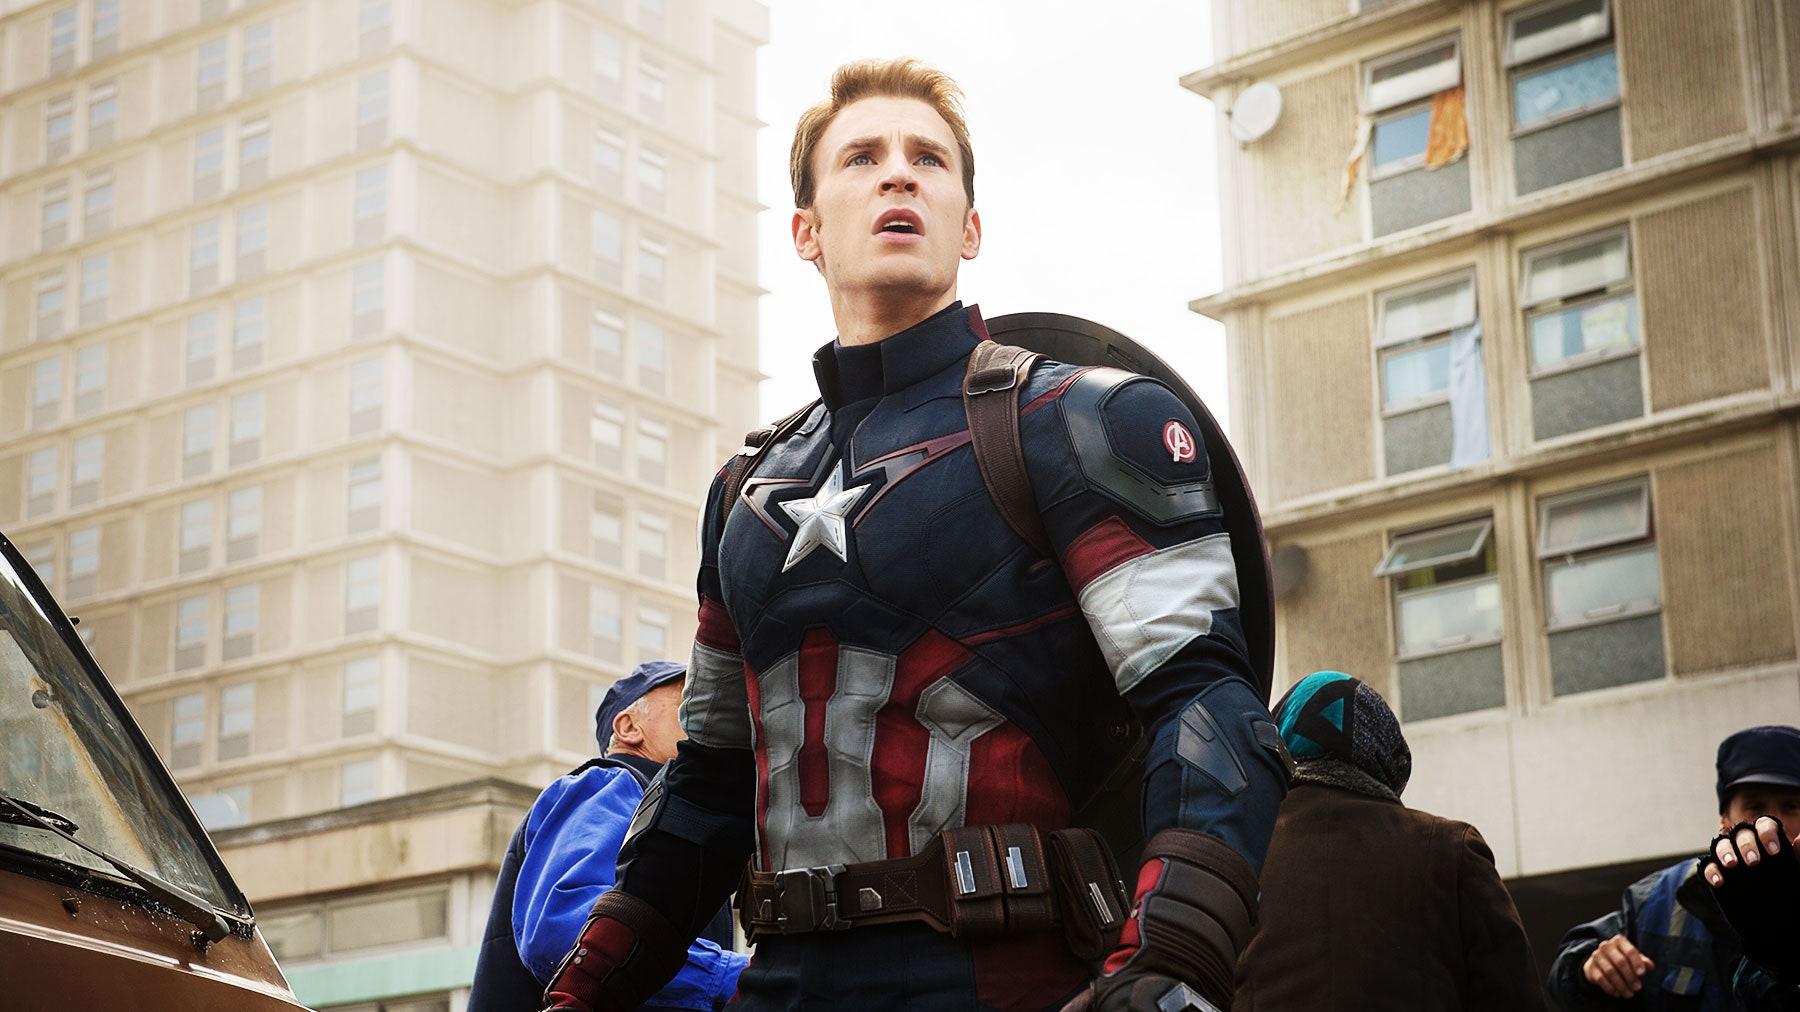 Chris Evans as Captain America in Winter Soldier